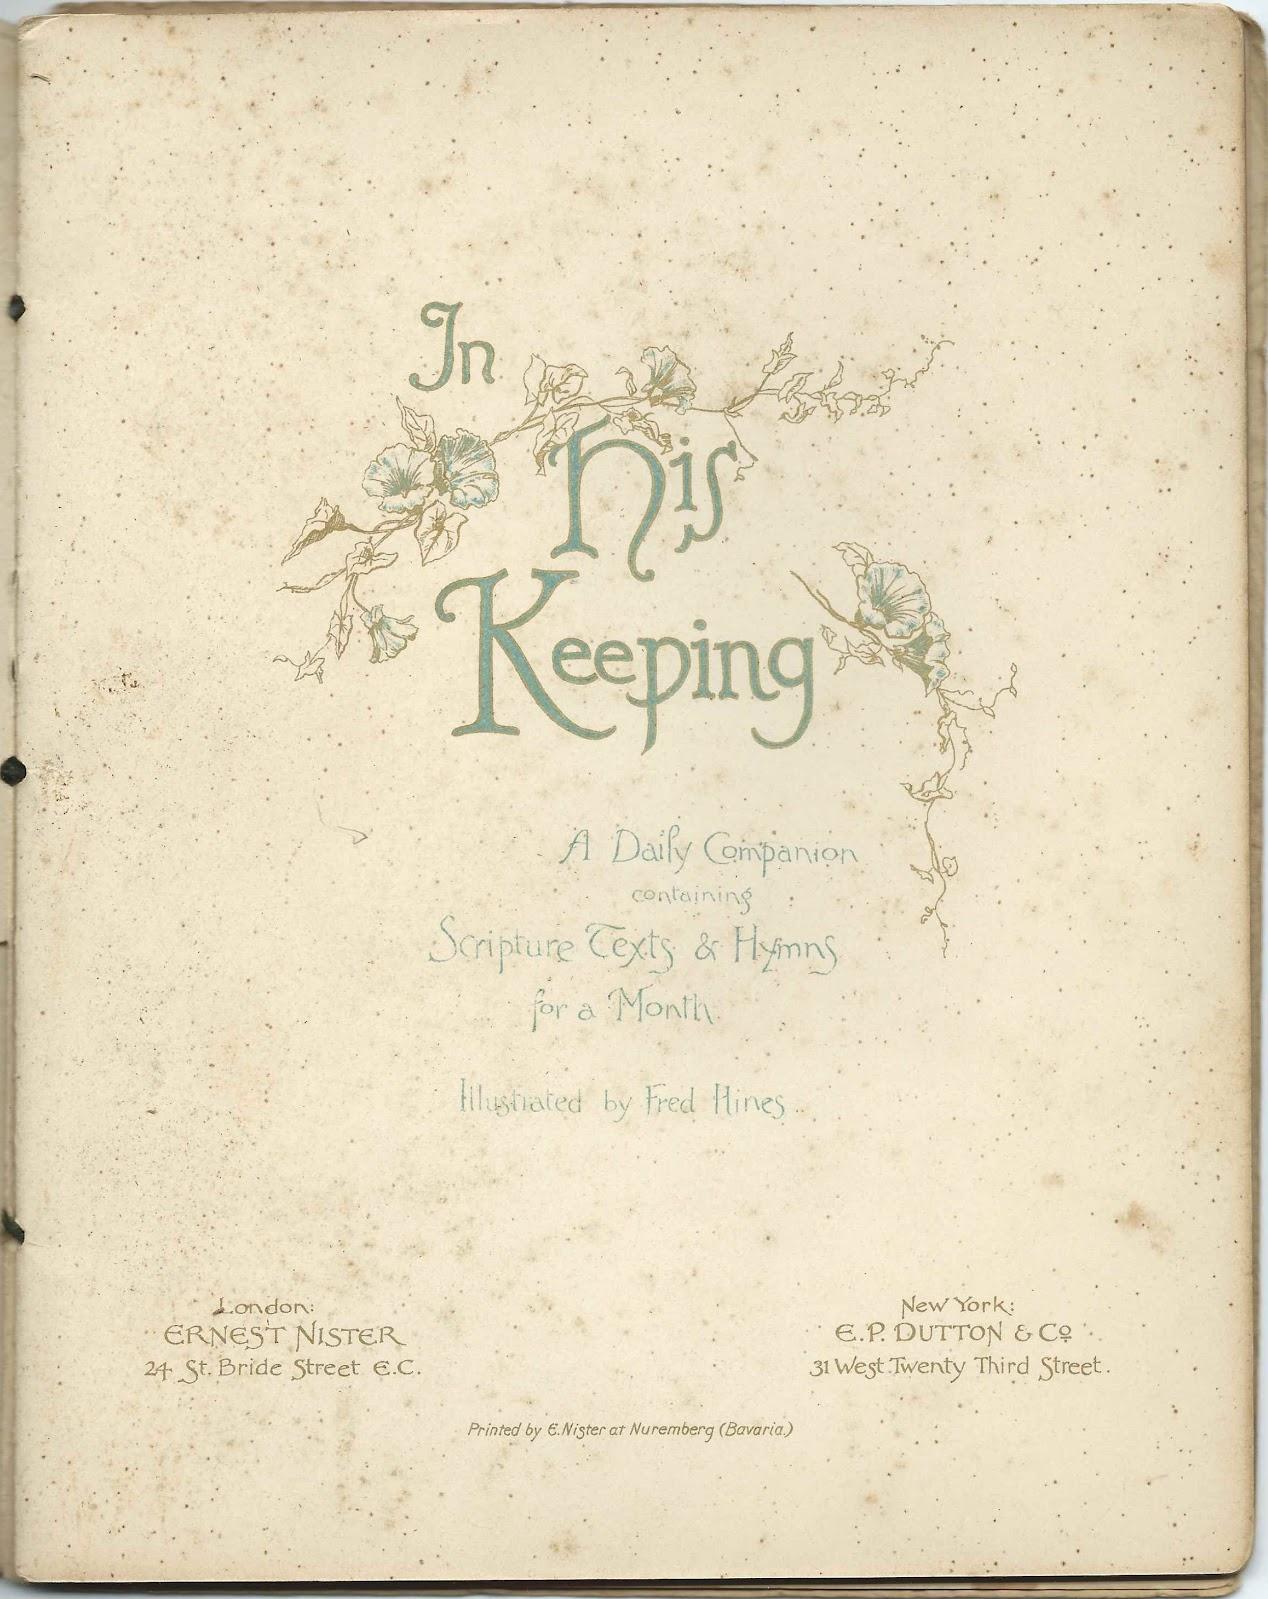 heirlooms reunited book  quot in his keeping quot  that belonged to sarah homer linkedin sarah homersham